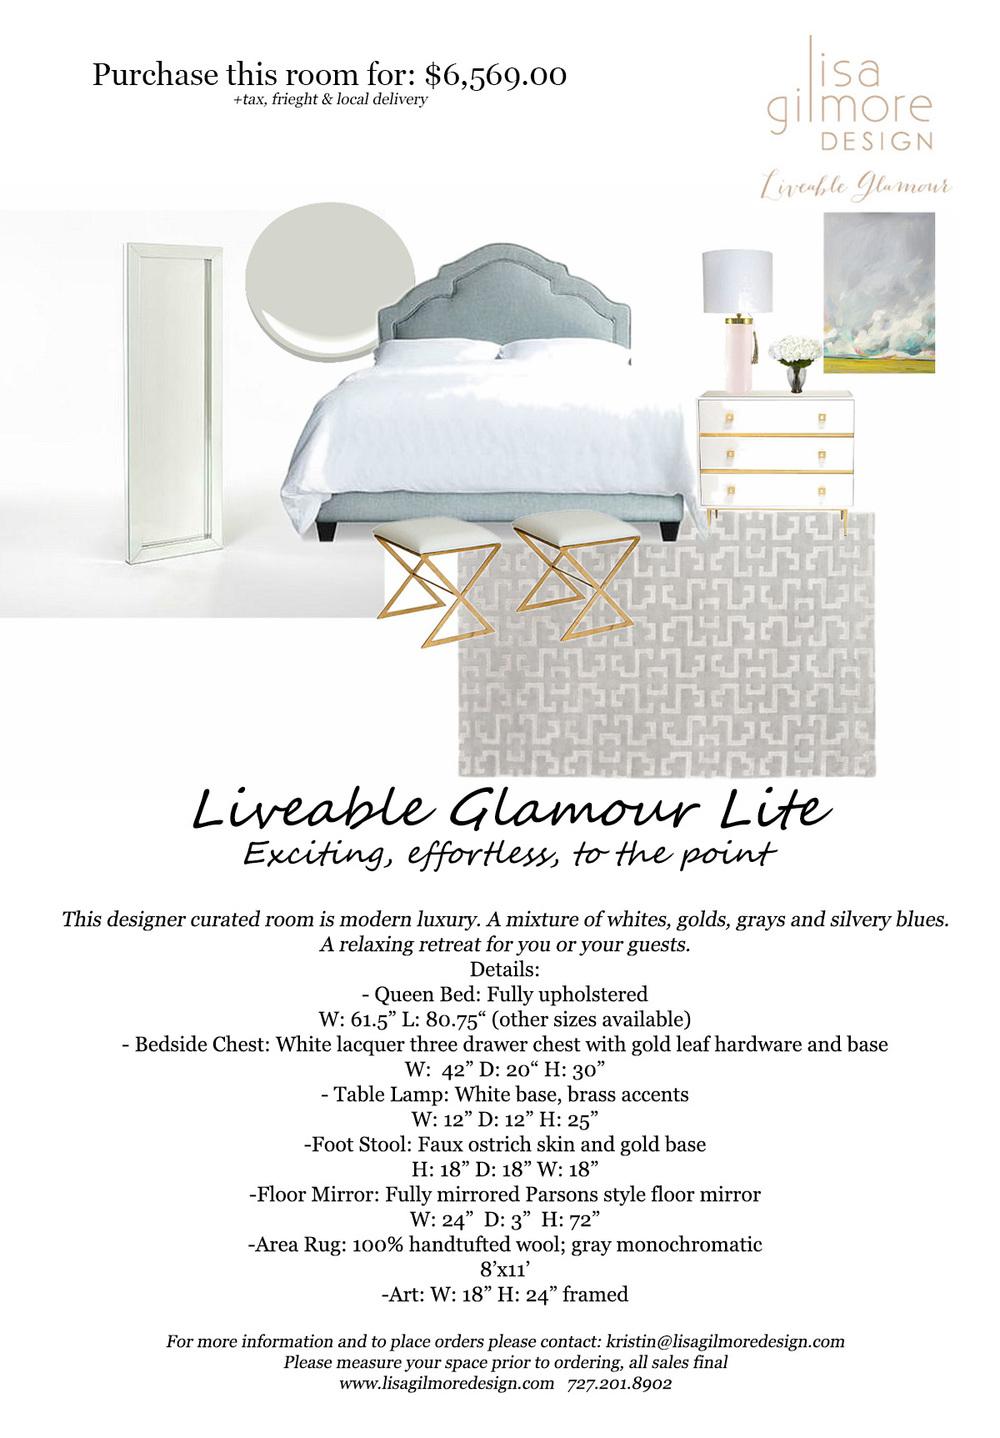 modernlux.liveableglamourlite.lisagilmoredesign